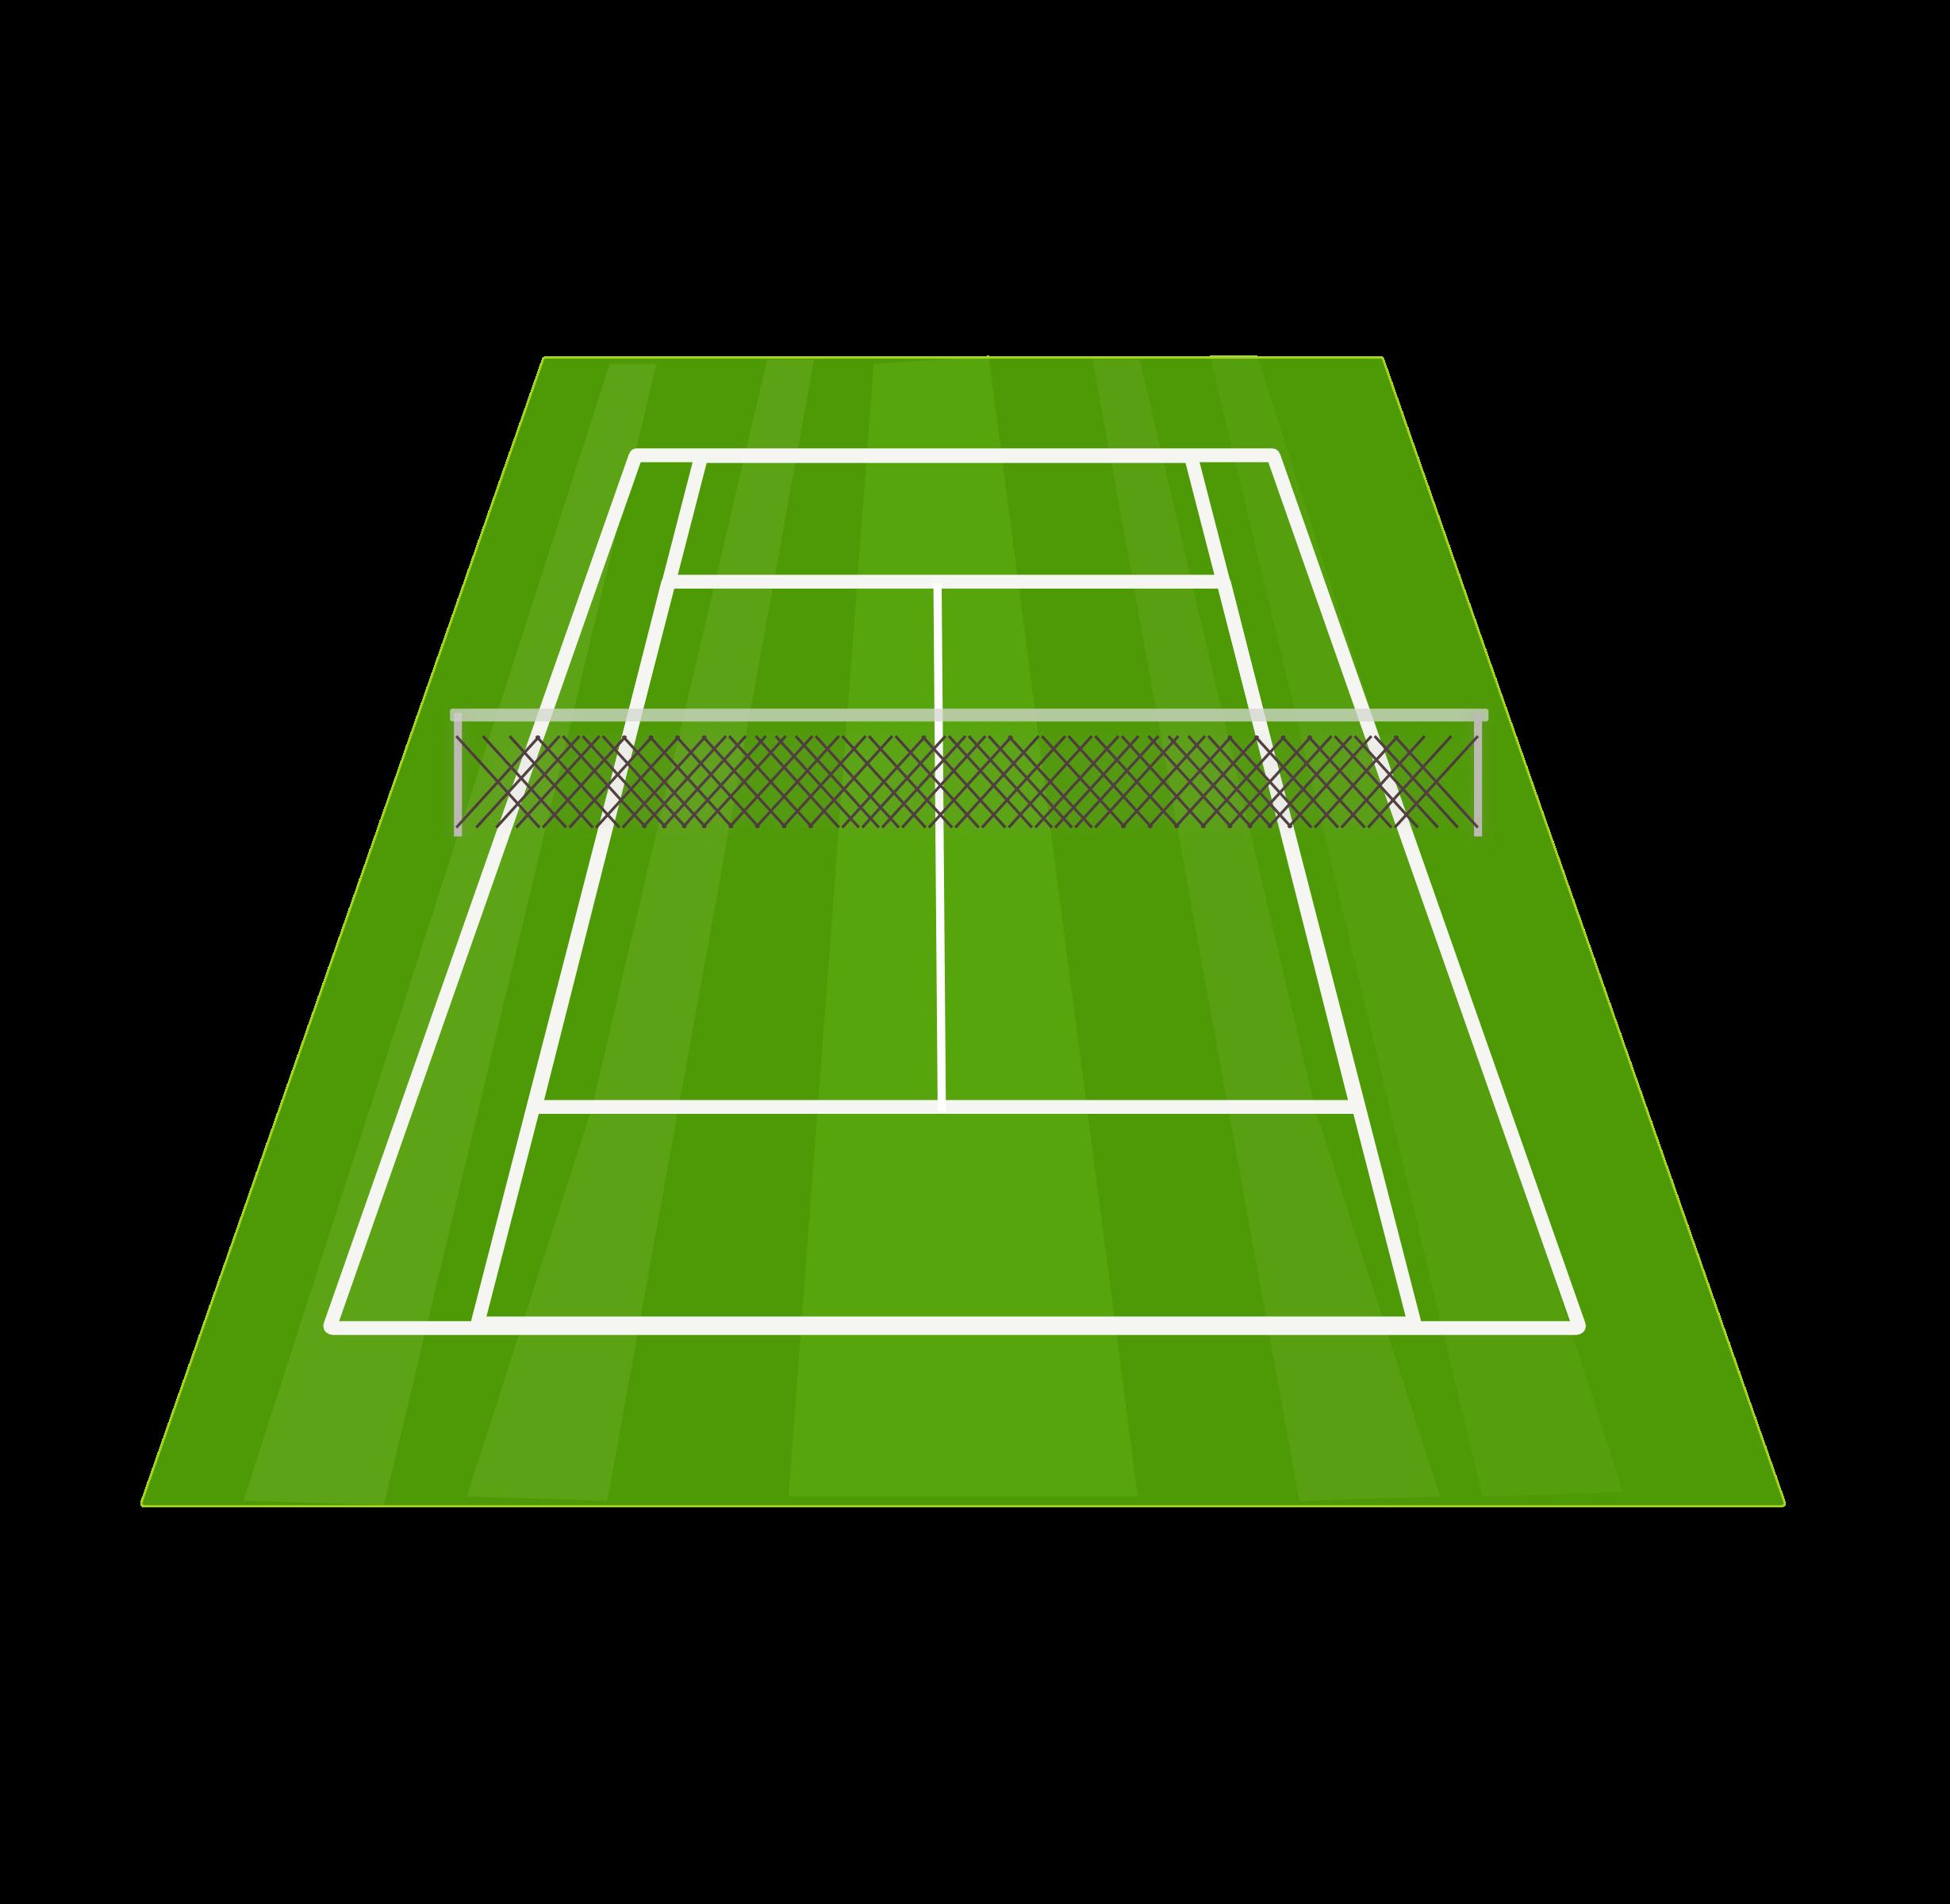 Tennis Clipart Clipart Suggest